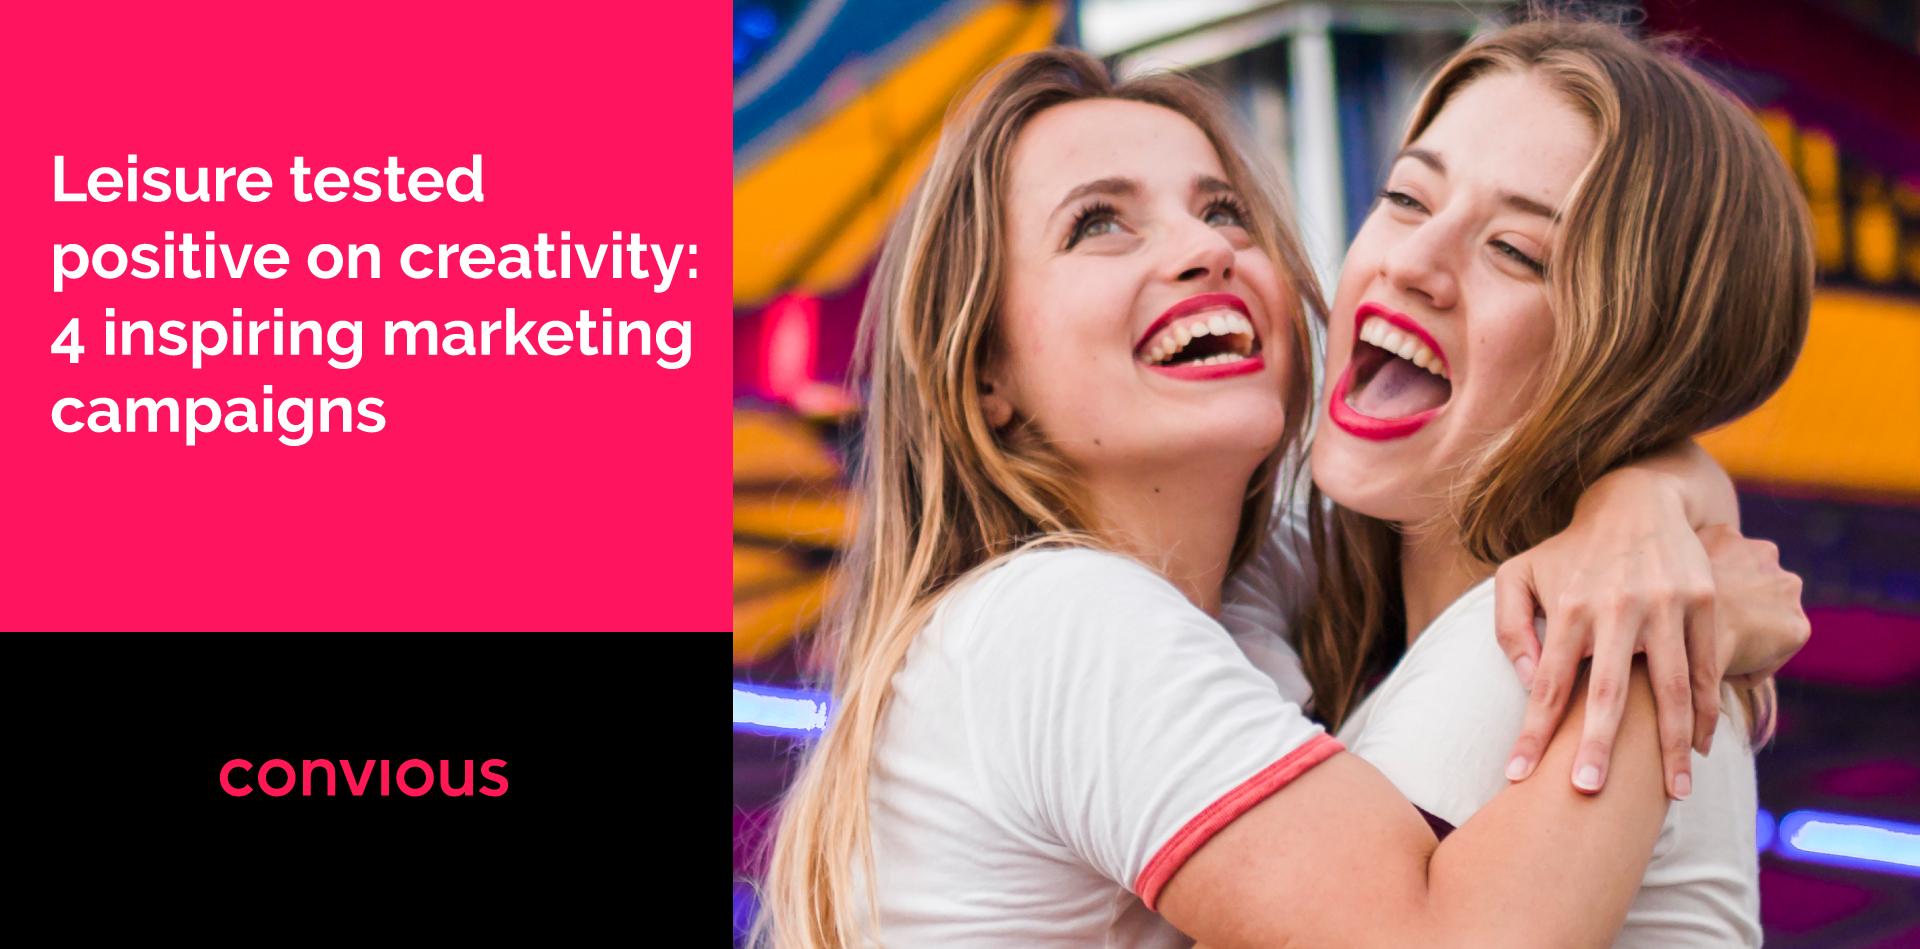 4 inspiring marketing campaigns